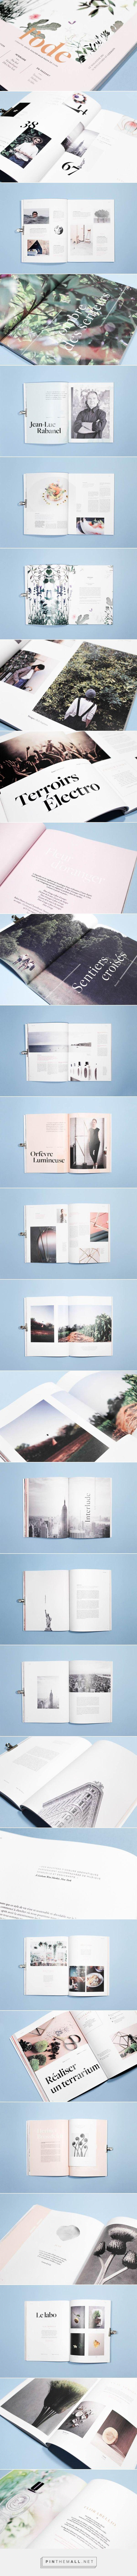 Editorial Design Inspiration: l'ode Magazine